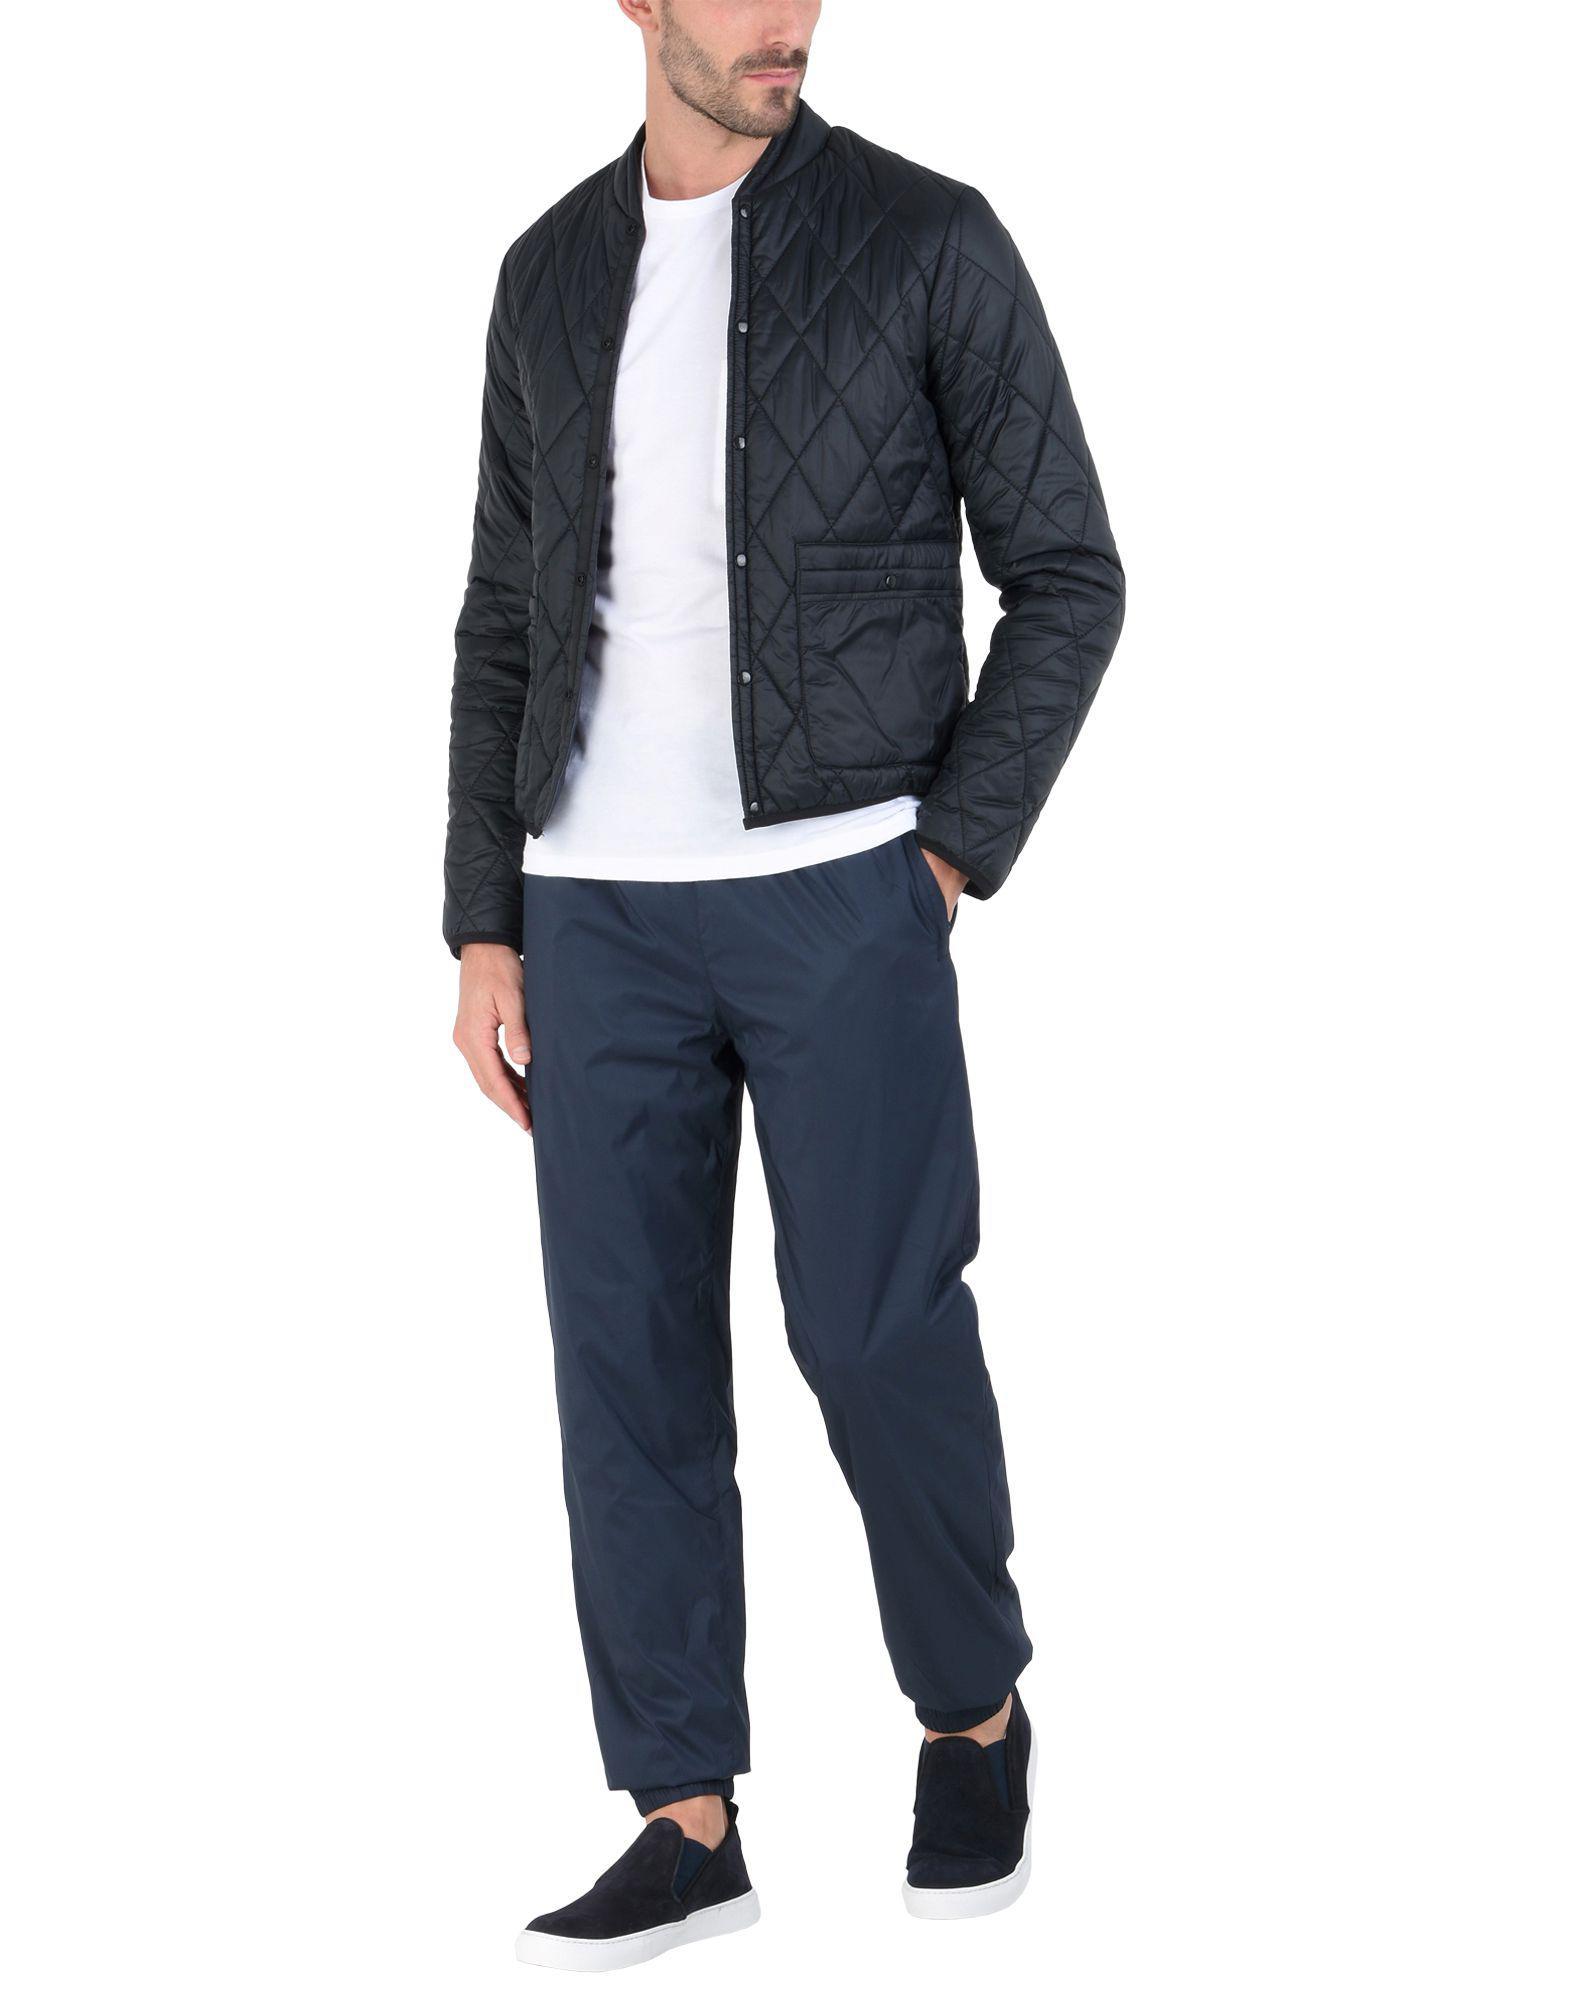 WOOD WOOD Casual Trouser in Dark Blue (Blue) for Men